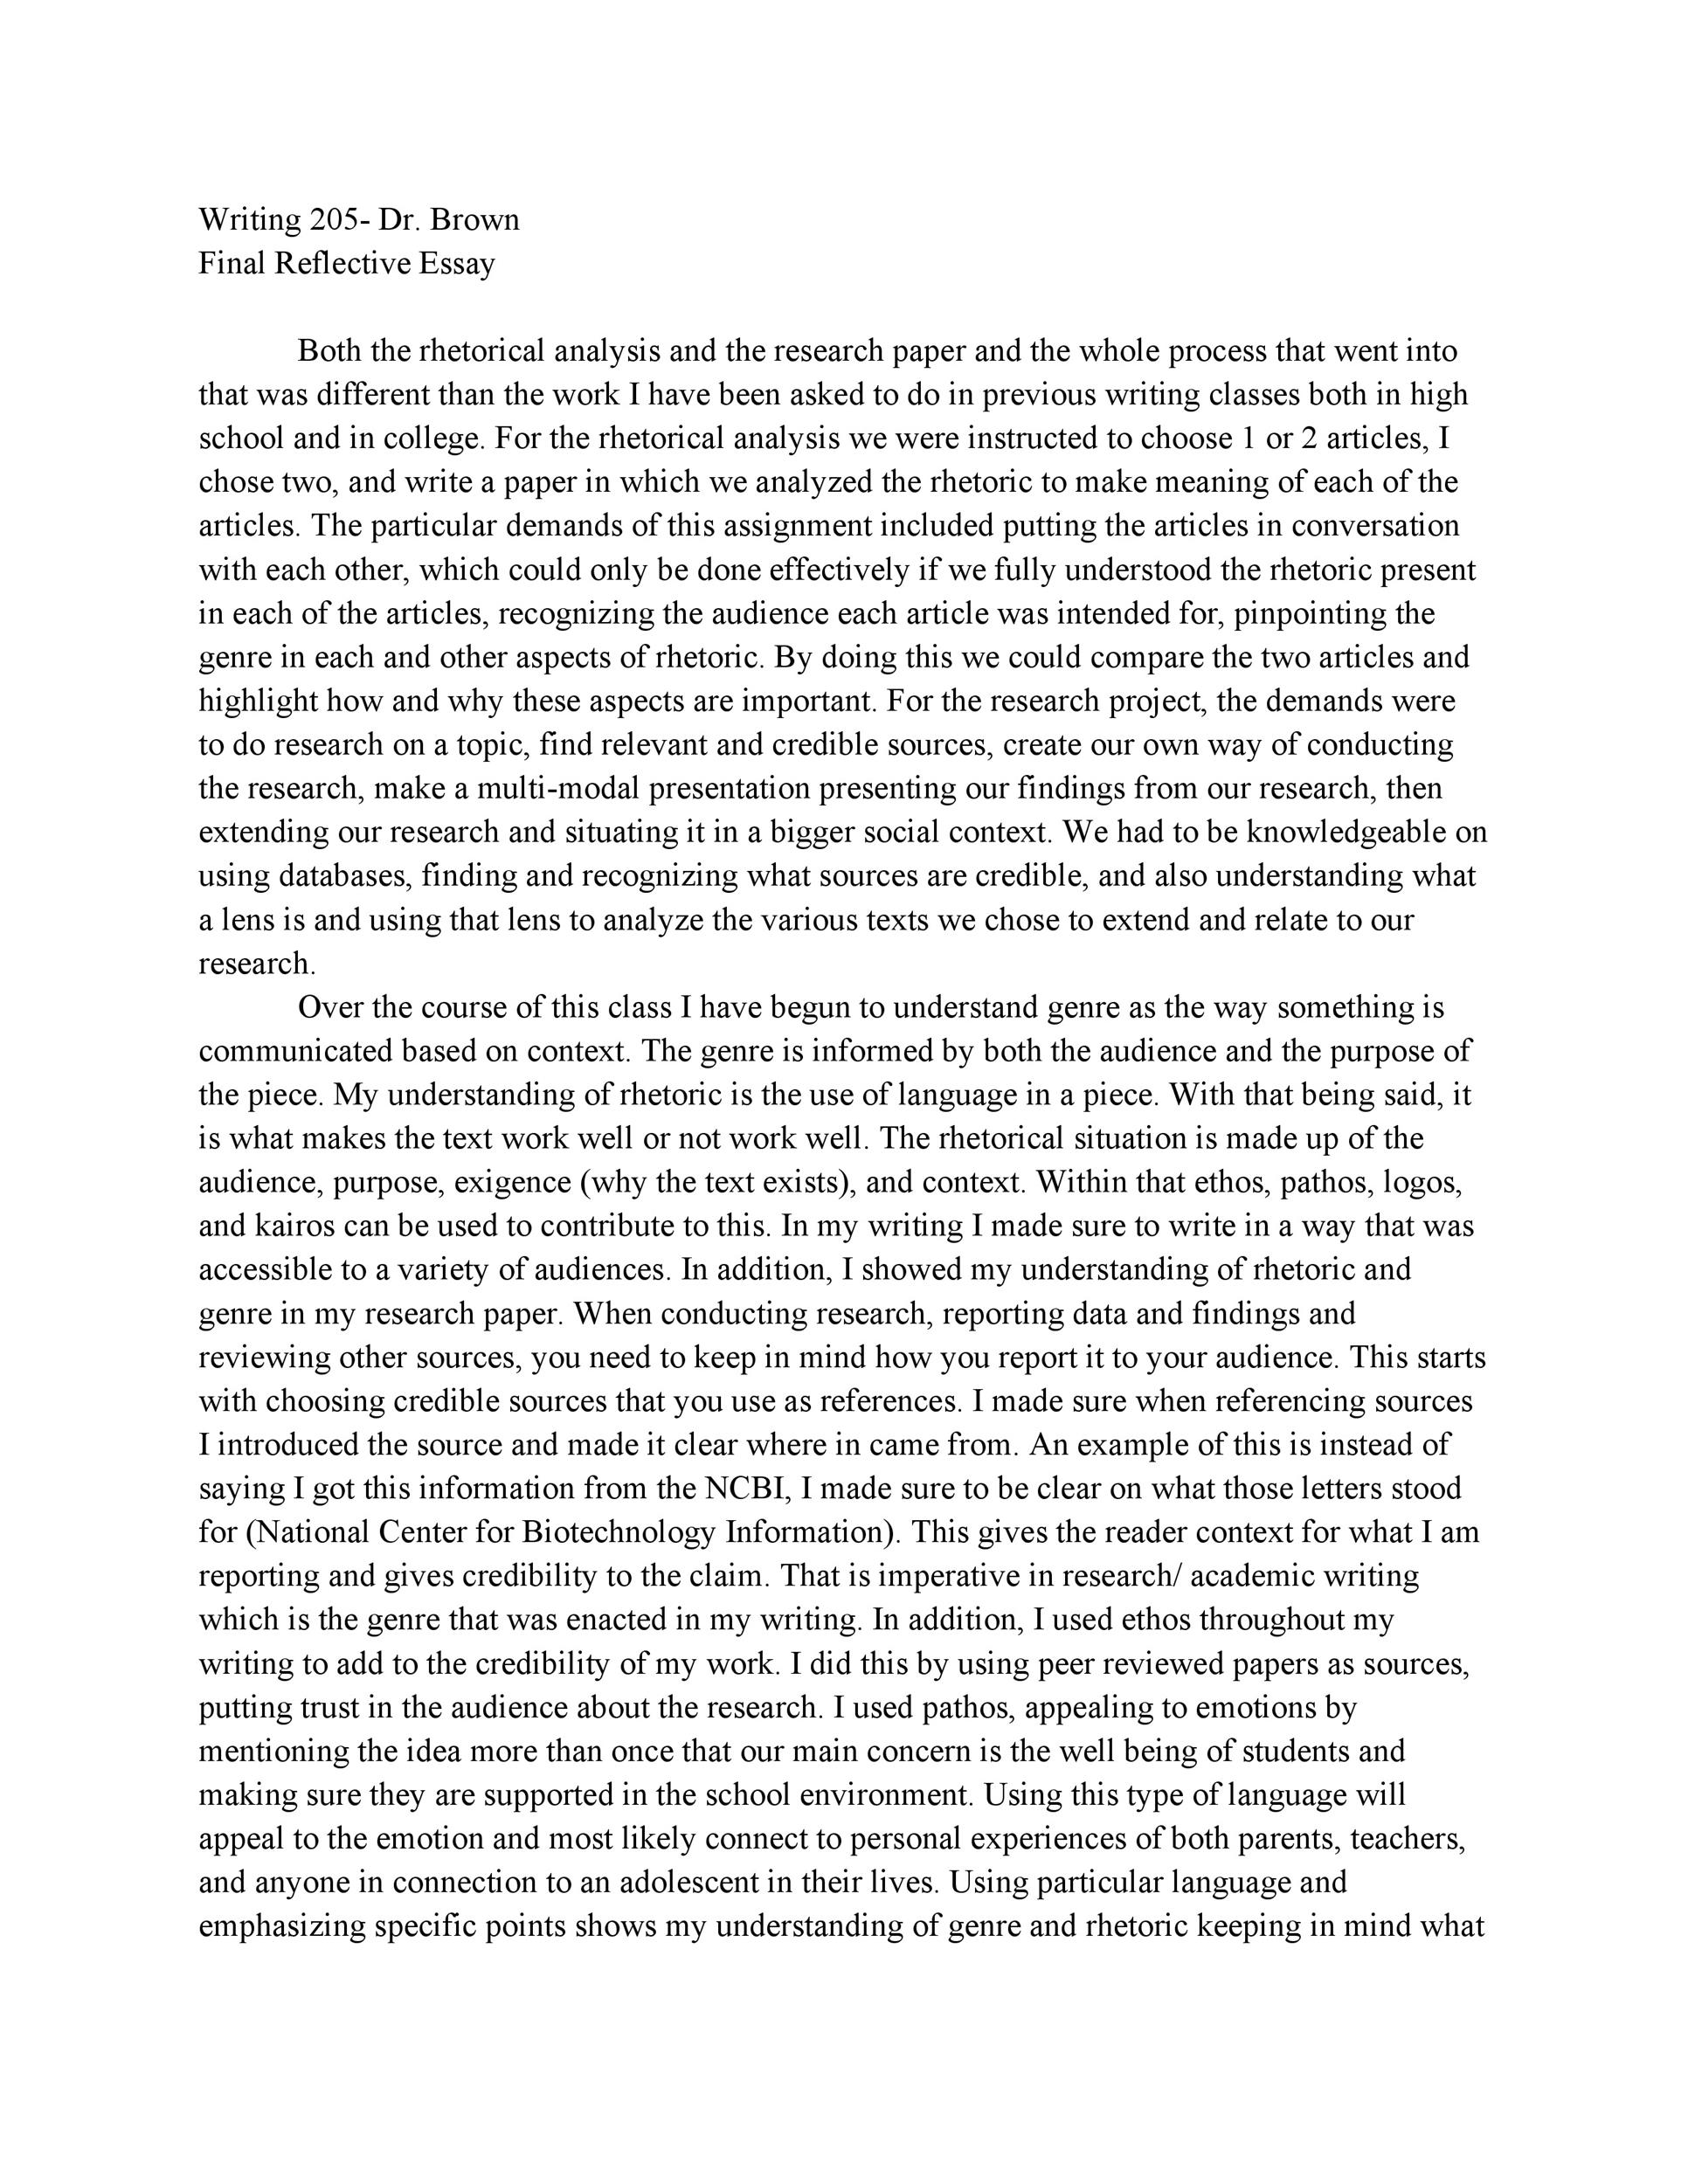 Free reflective essay example 37